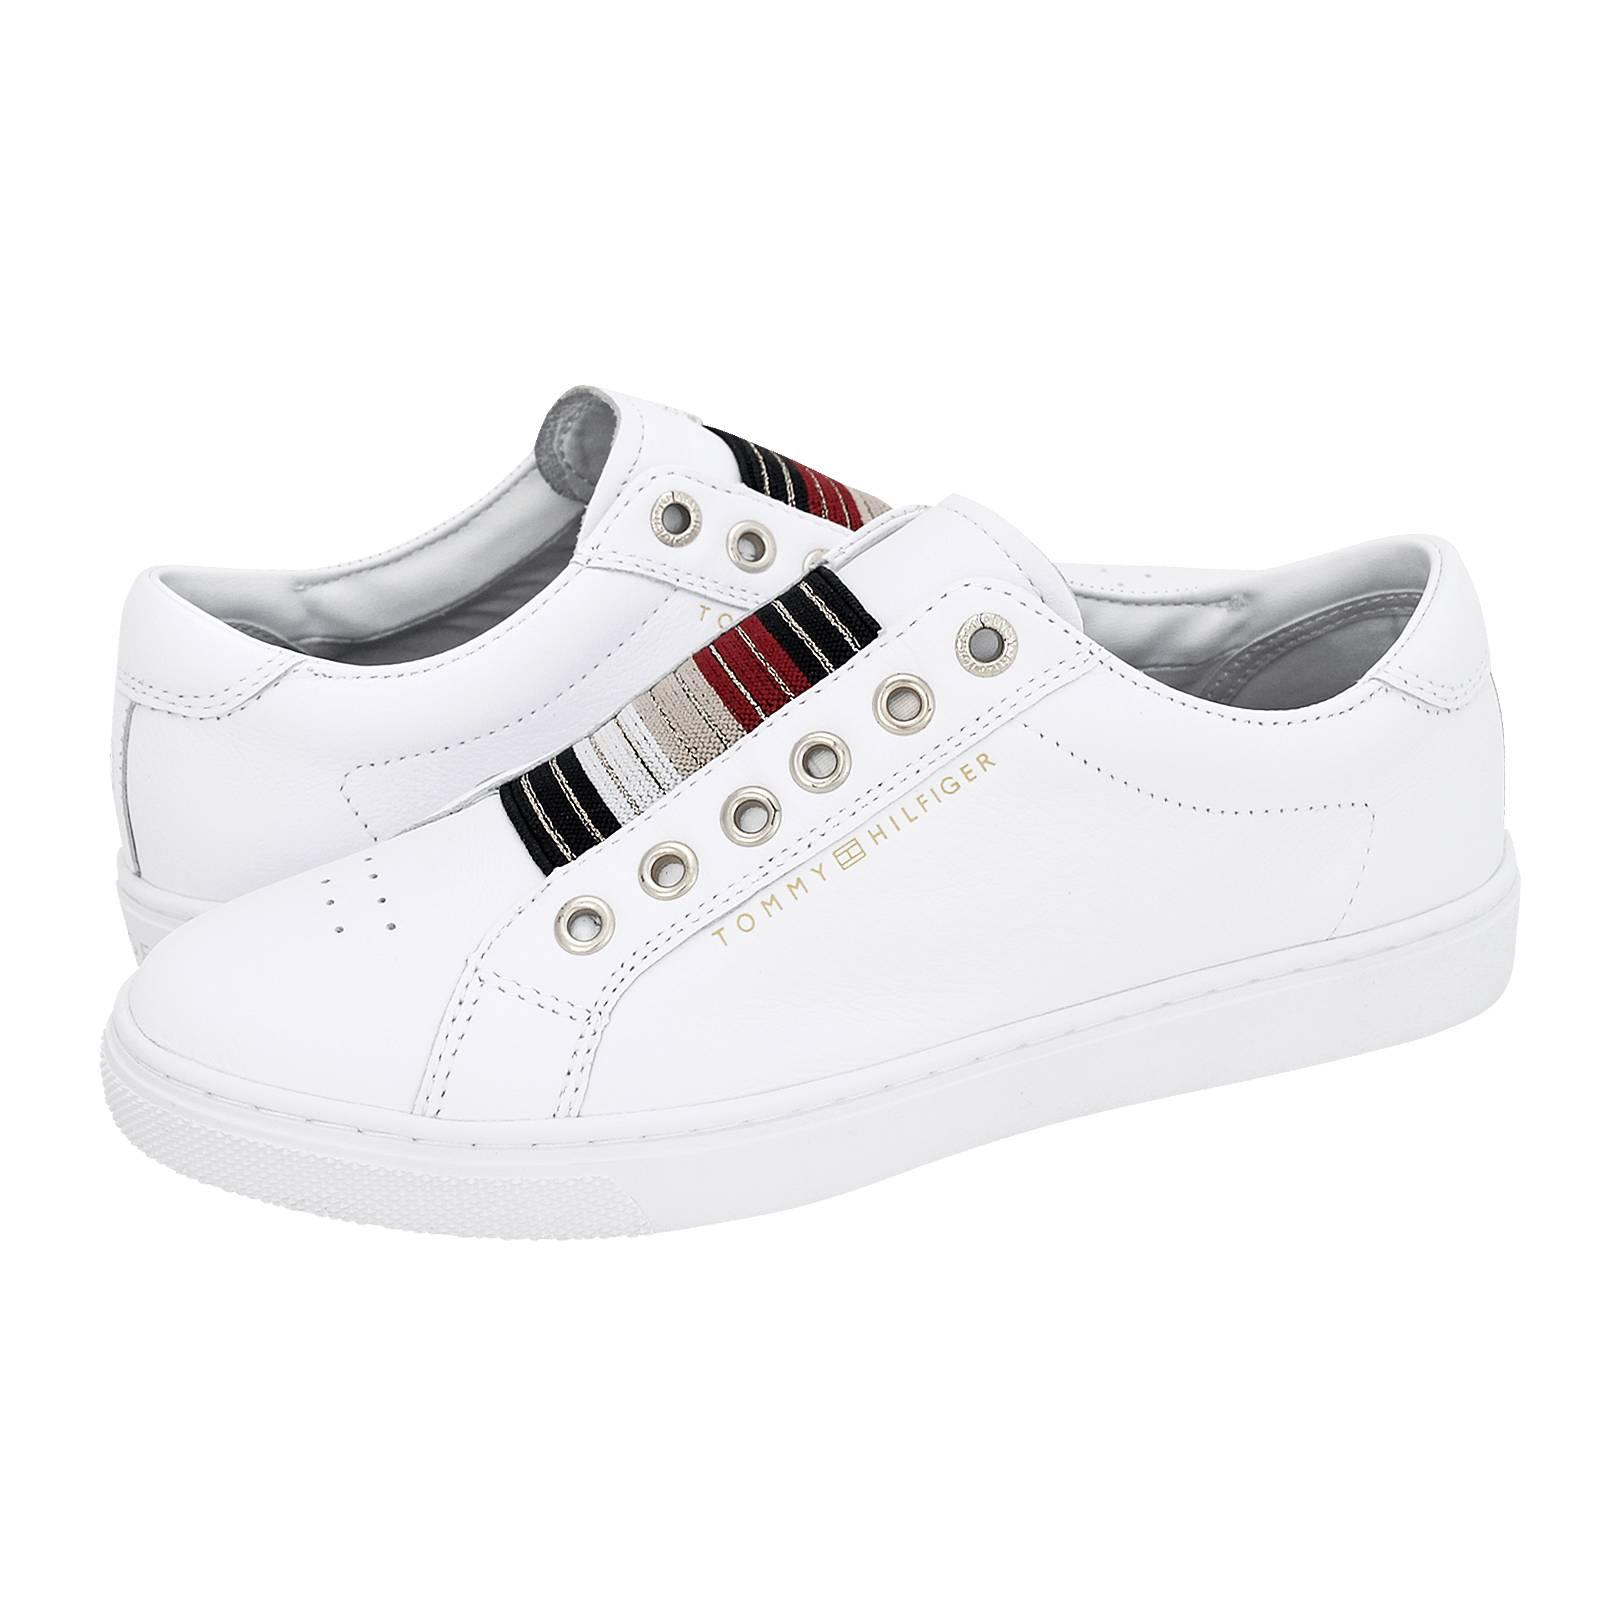 Venus 8A1 - Γυναικεία παπούτσια casual Tommy Hilfiger από δέρμα ... 3dd07c5ccc7